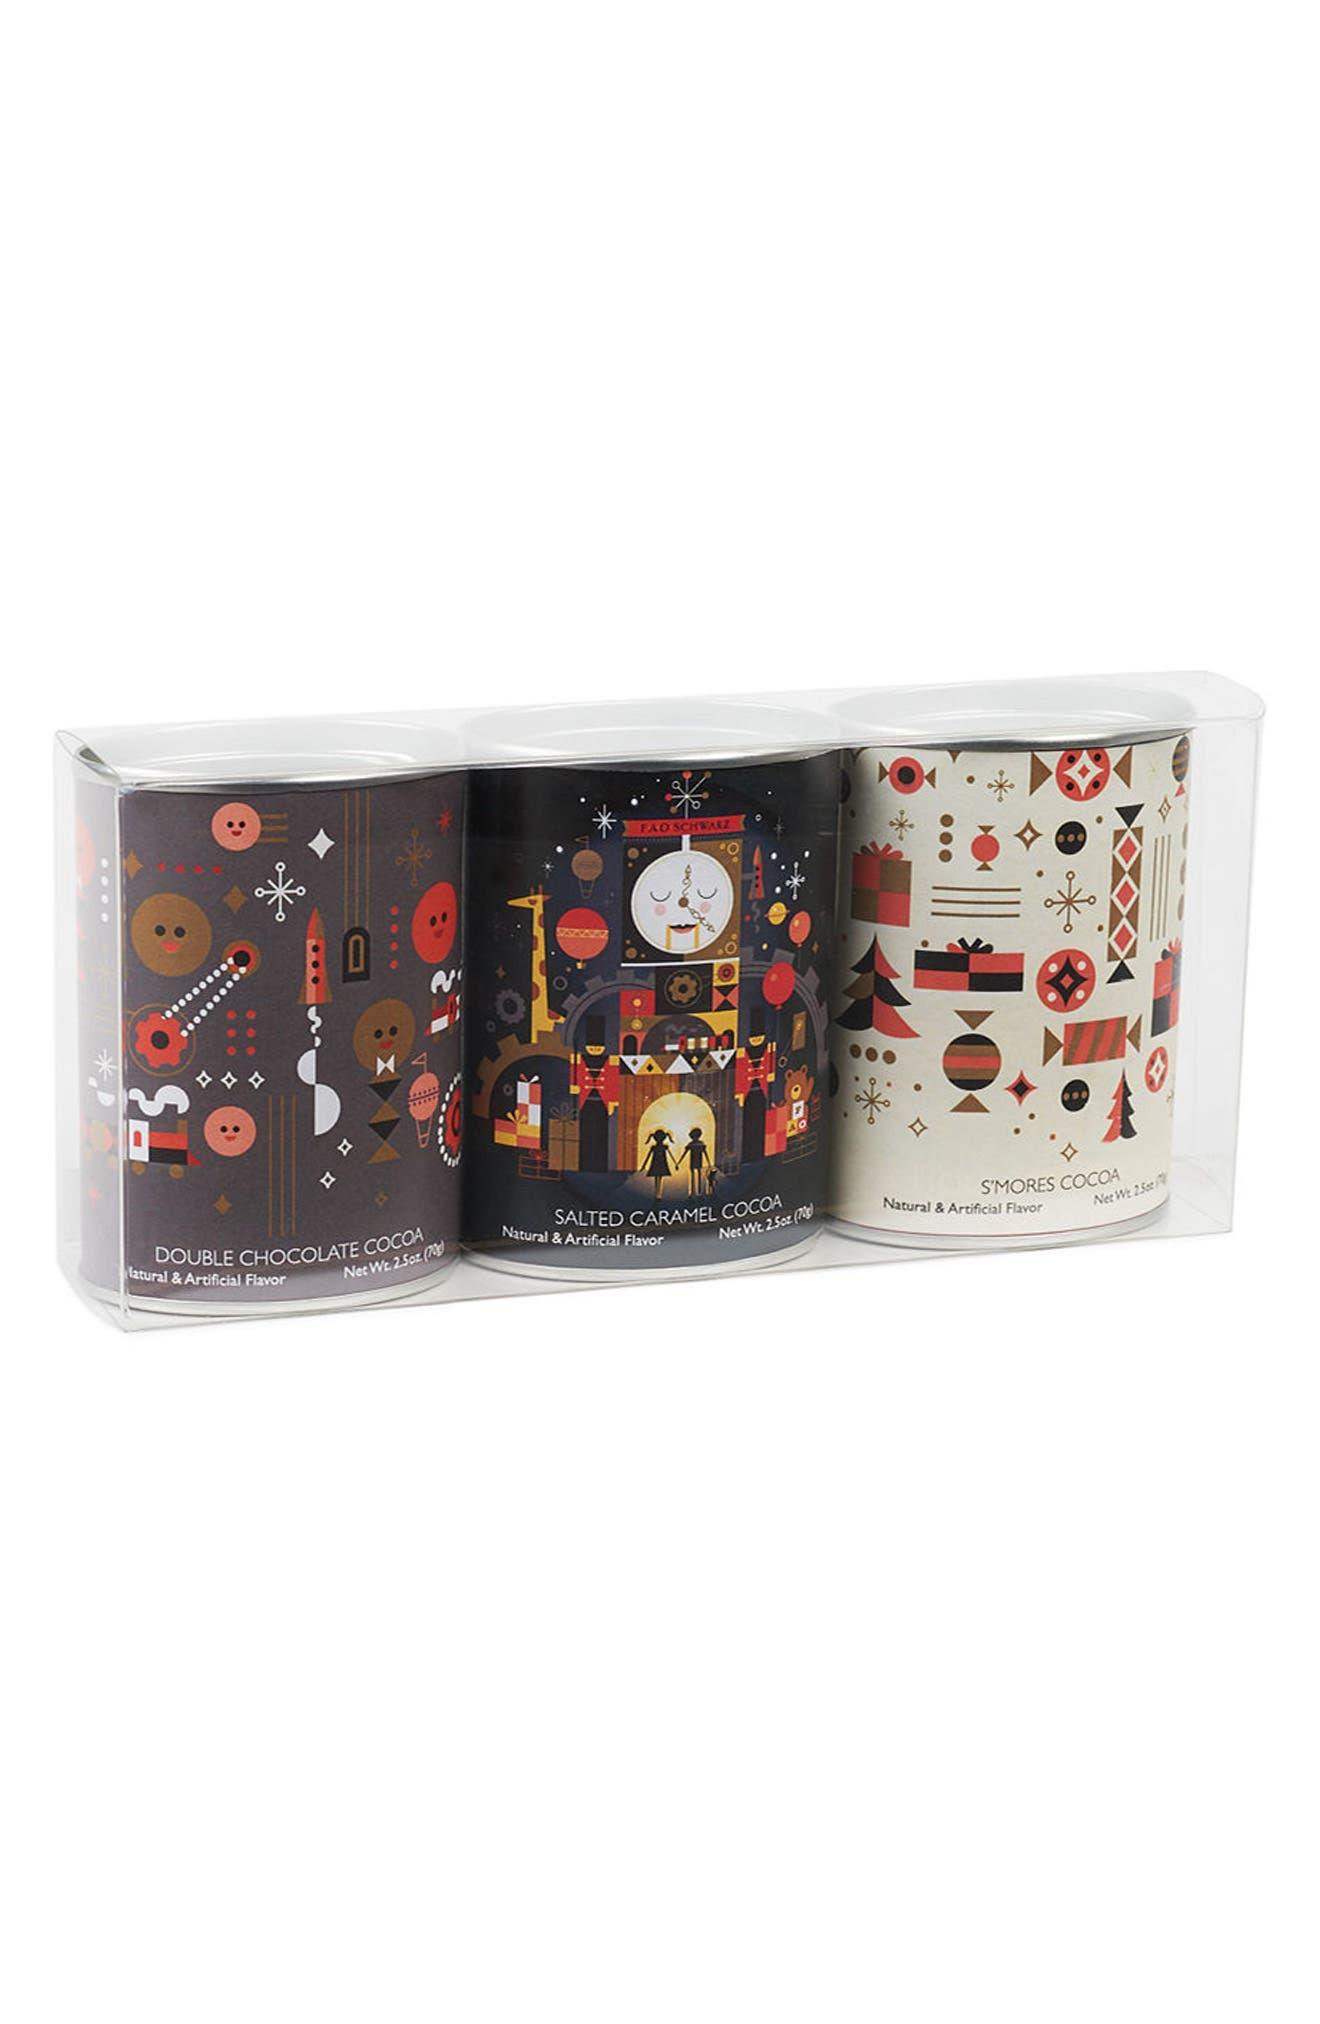 Dylan's Candy Bar x FAO Schwarz 3-Pack Assortment Hot Chocolate Tin Gift Set